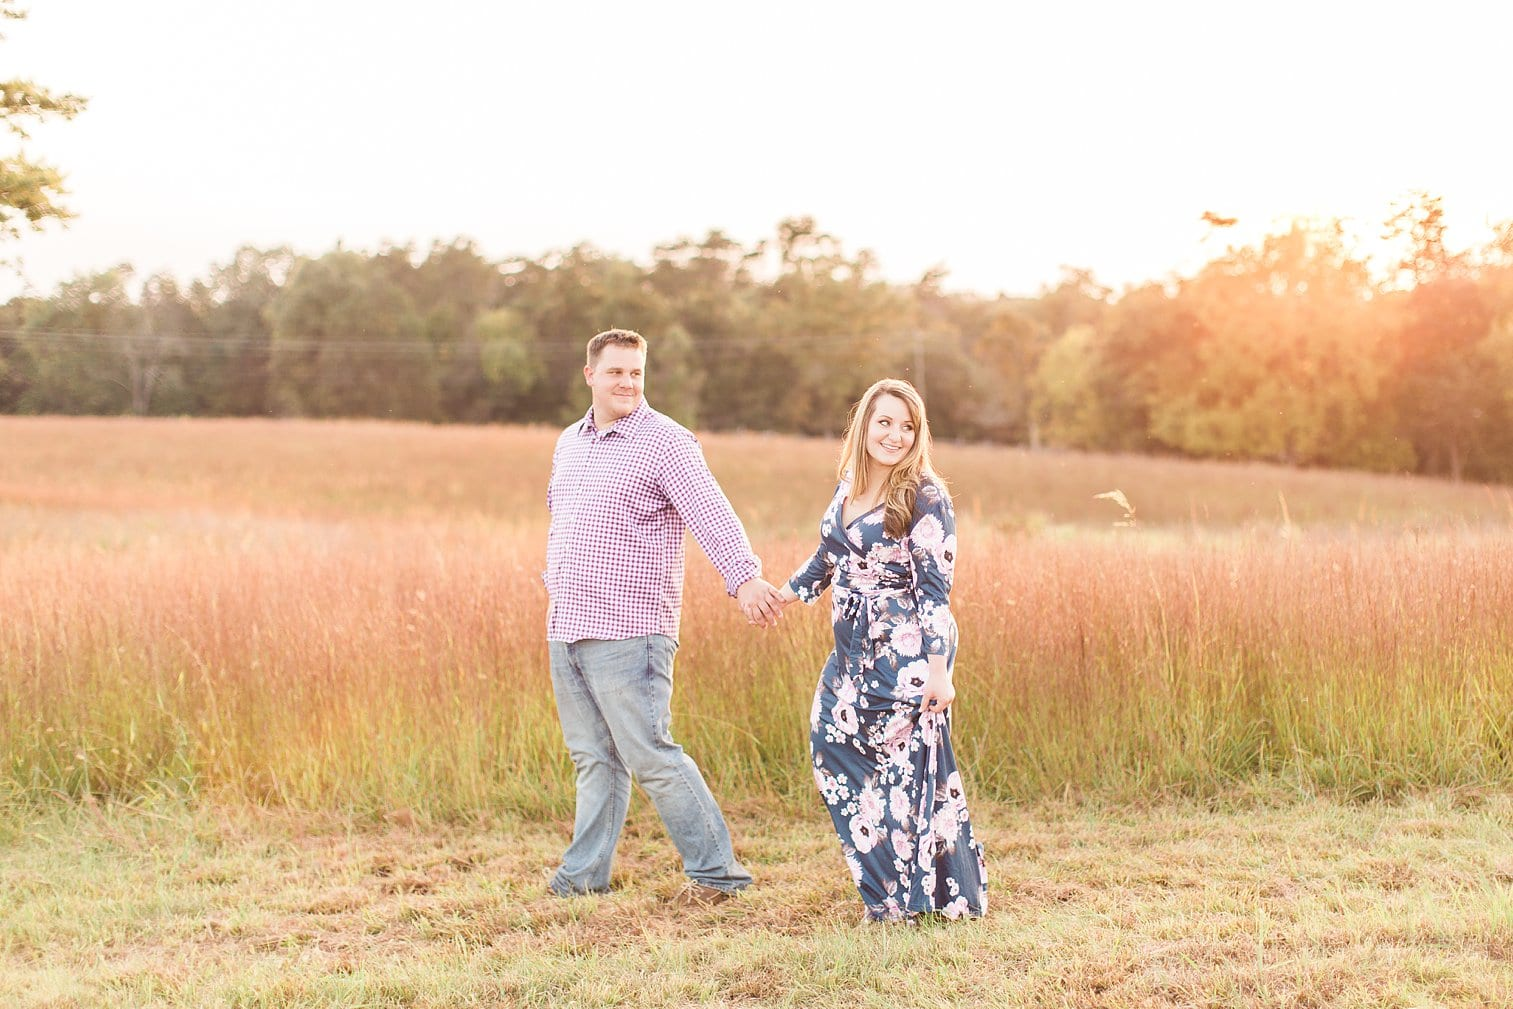 Henry Hill Manassas Battlefield Engagement Session Megan Kelsey Photography-206.jpg